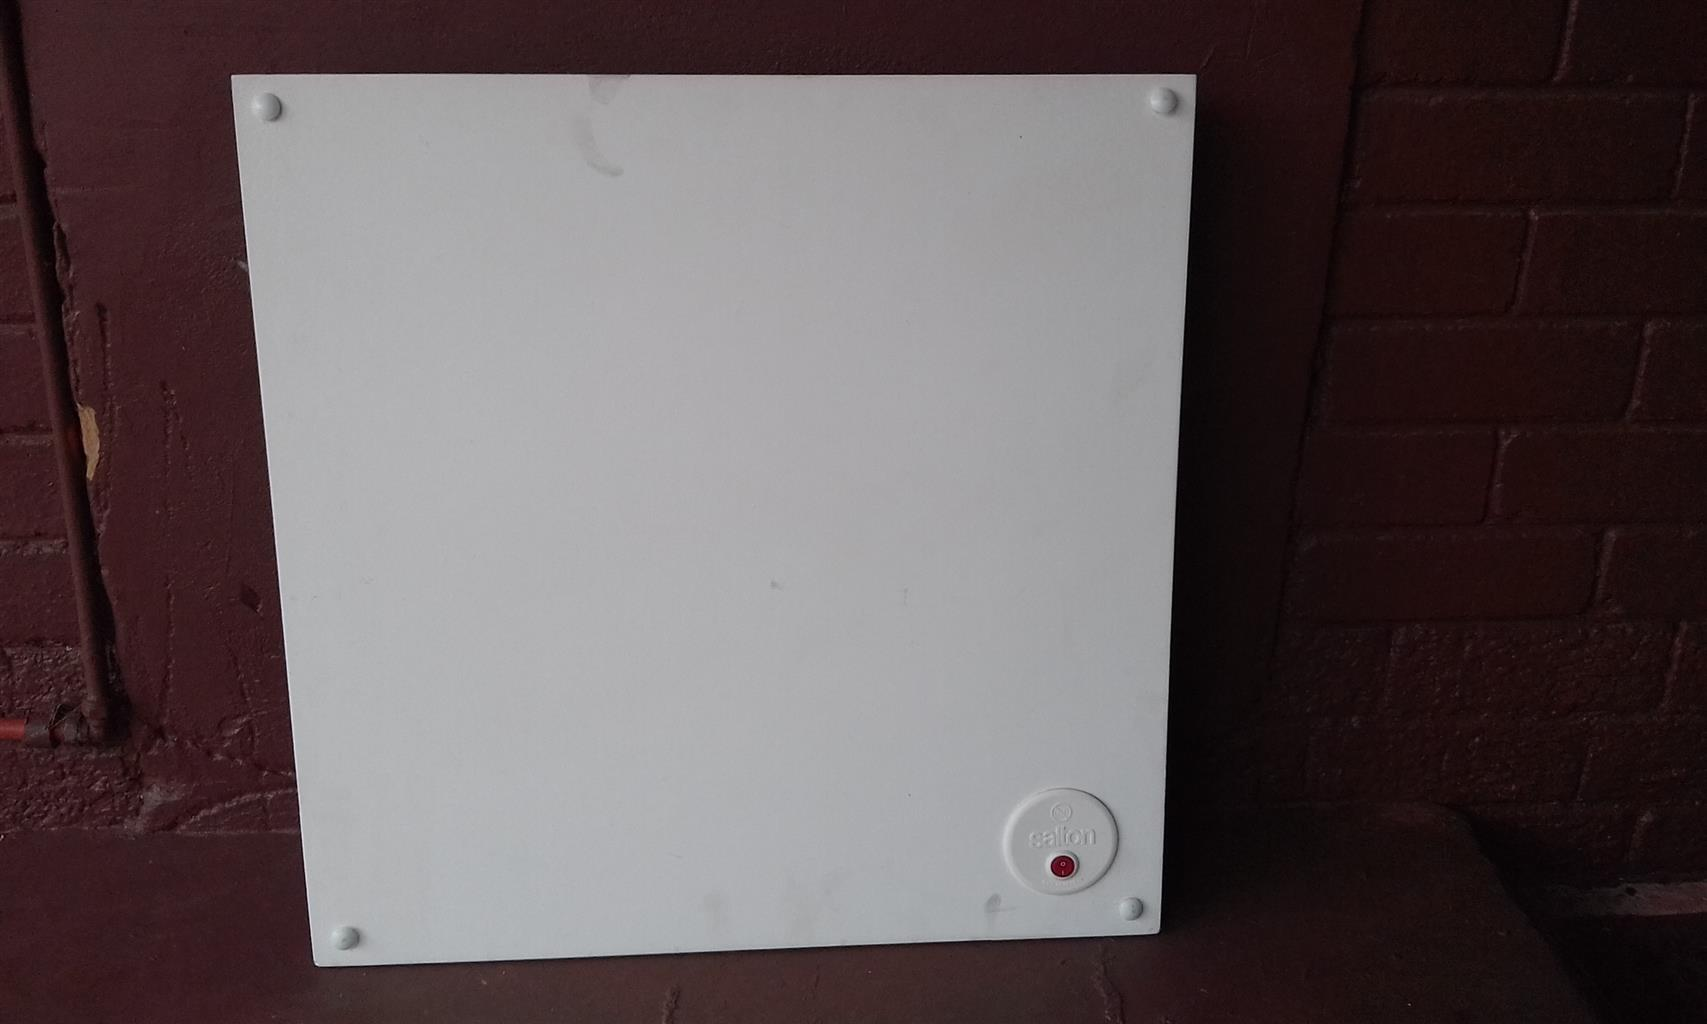 salton wall heater for sale